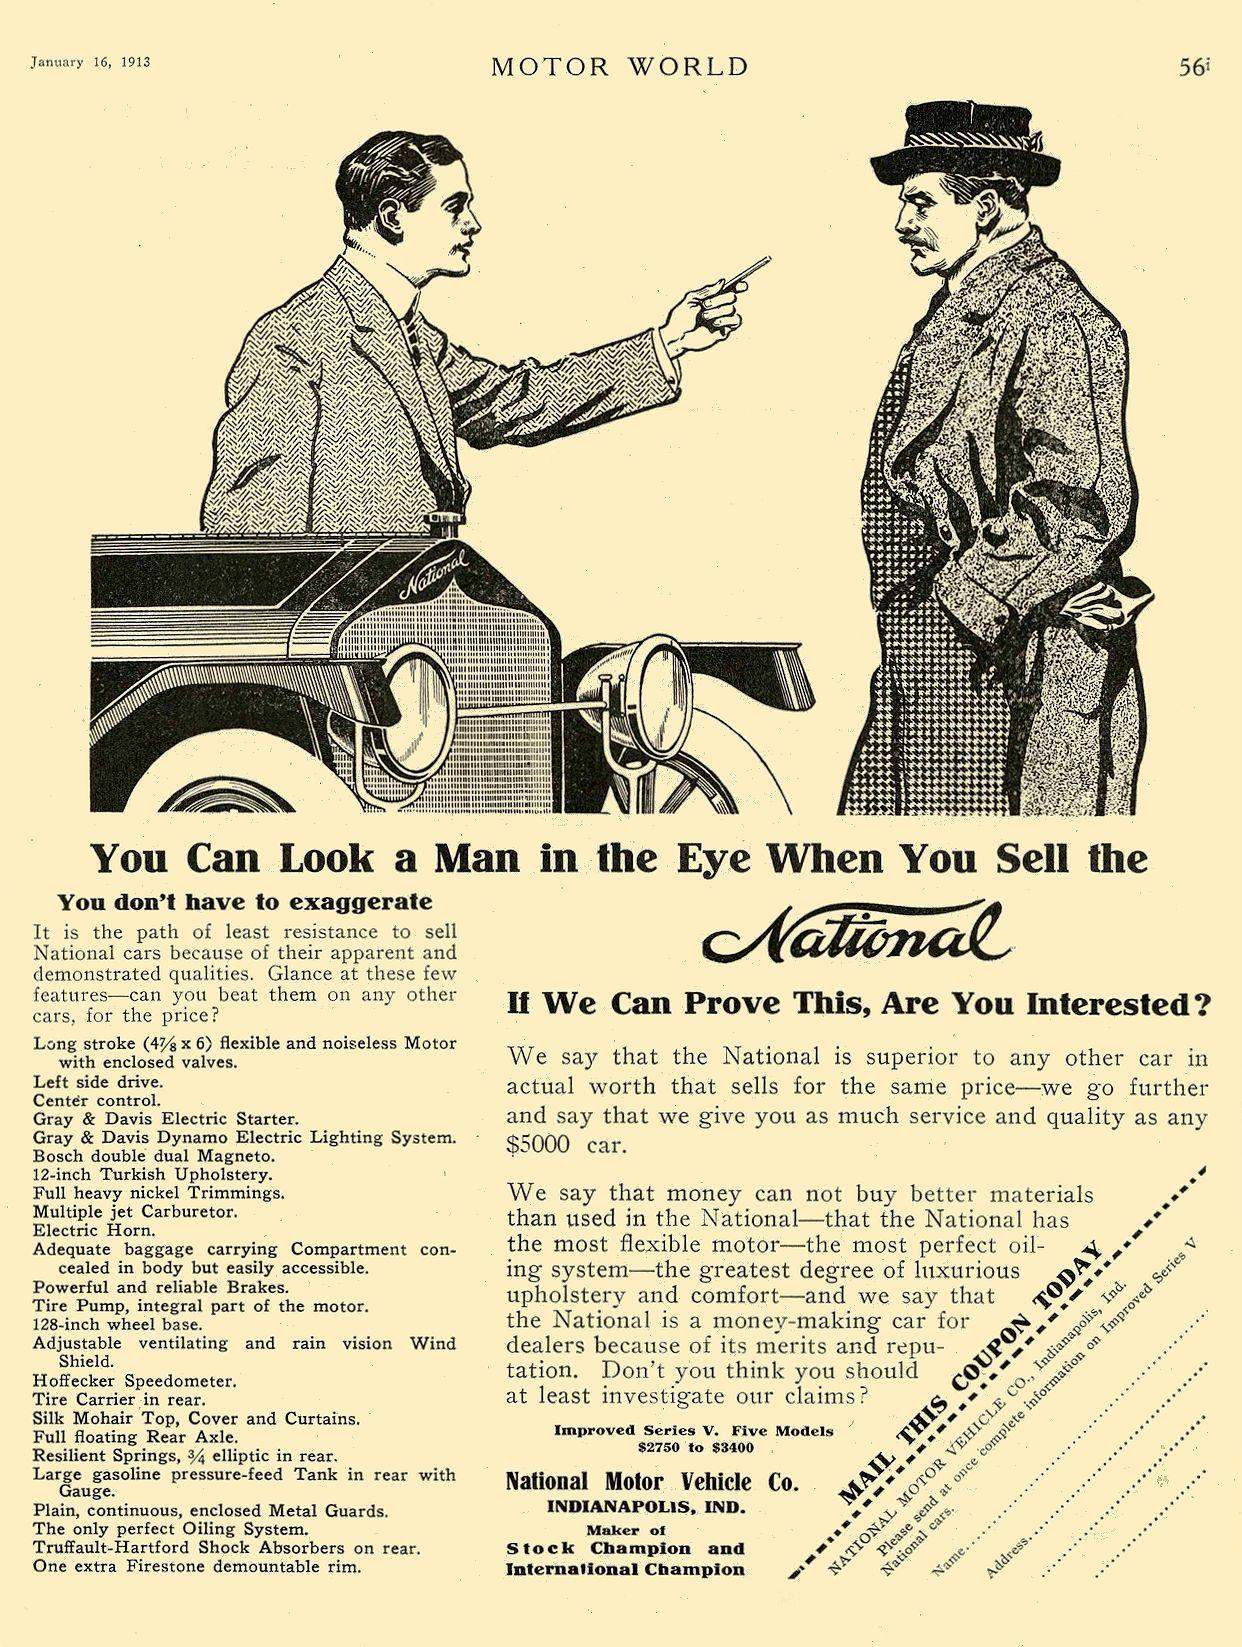 1913 1 16 NATIONAL National Motor Vehicle Co. Indianapolis, IND MOTOR WORLD January 16, 1913 8.5″x12″ page 56